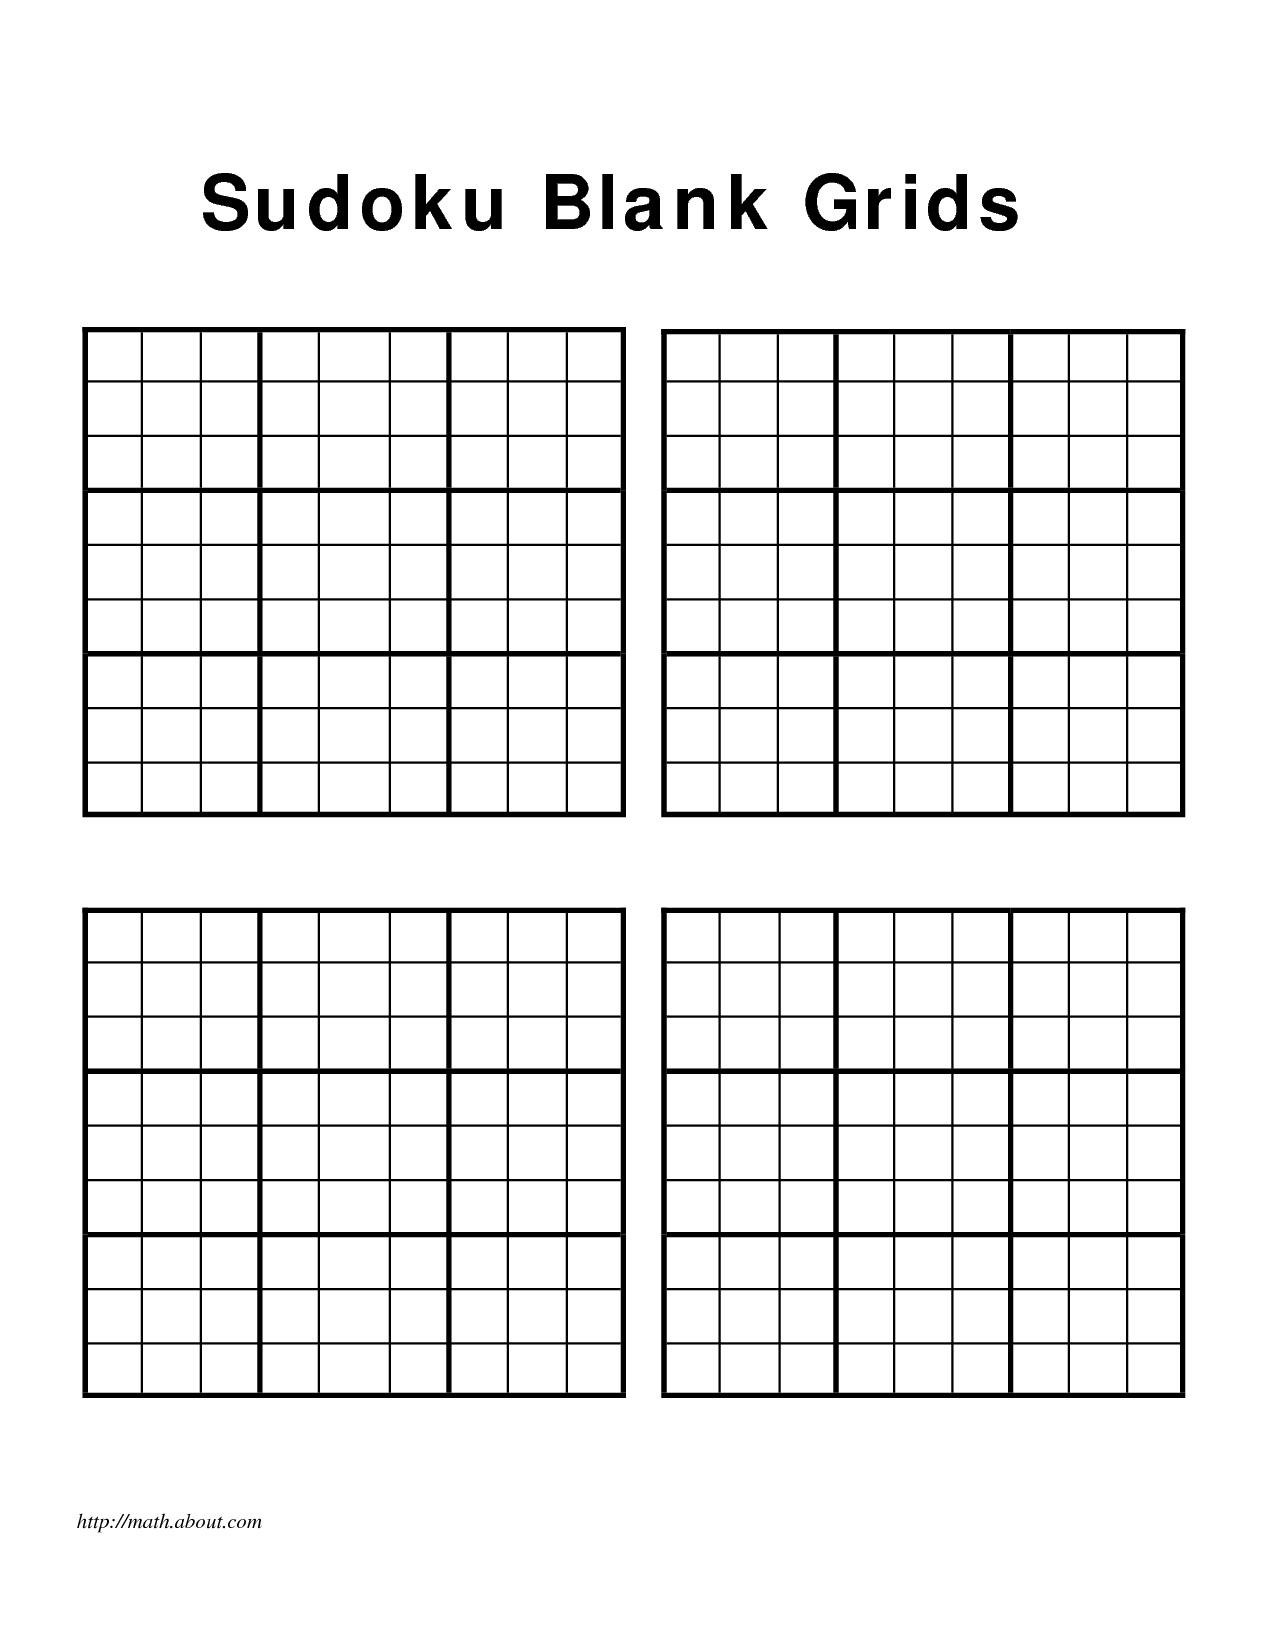 Easy Sudoku Worksheets | Printable Worksheets And Activities